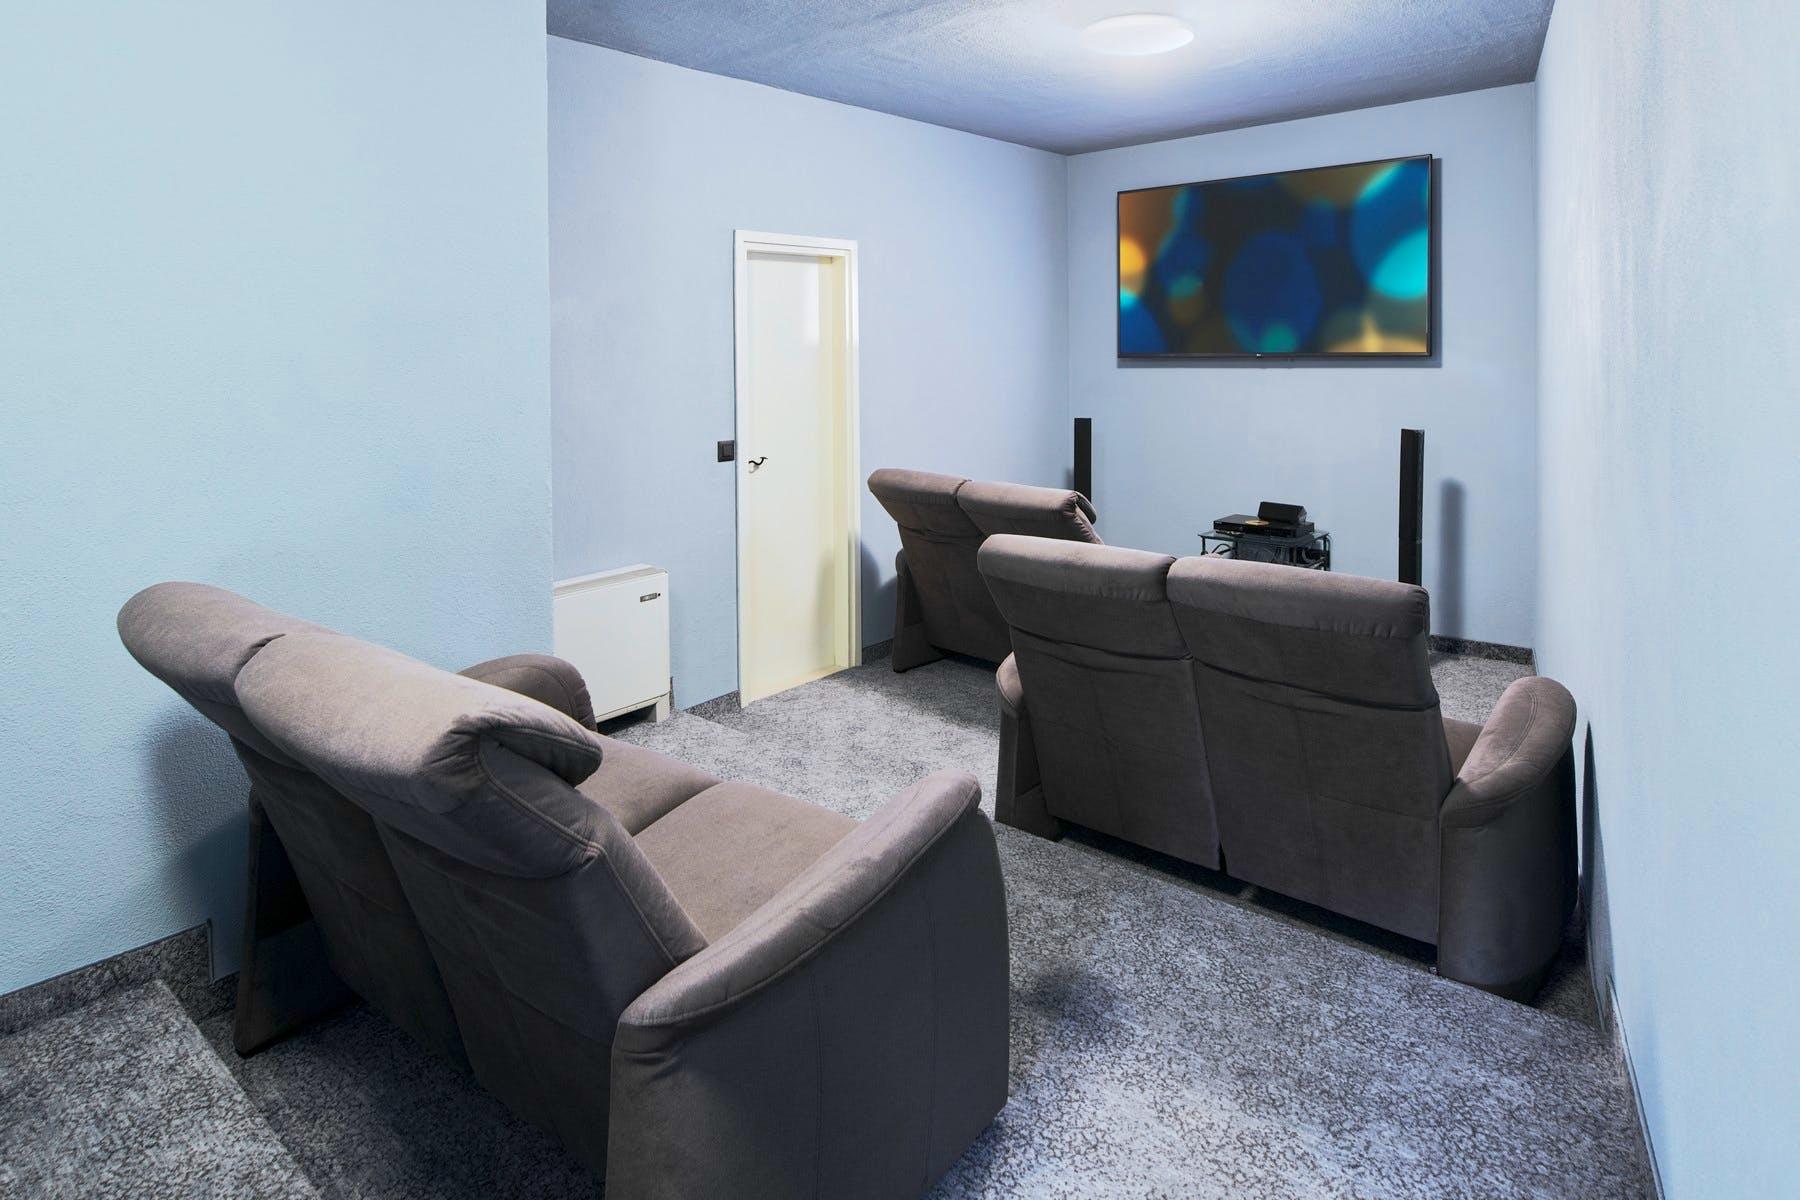 Cozy indoor cinema